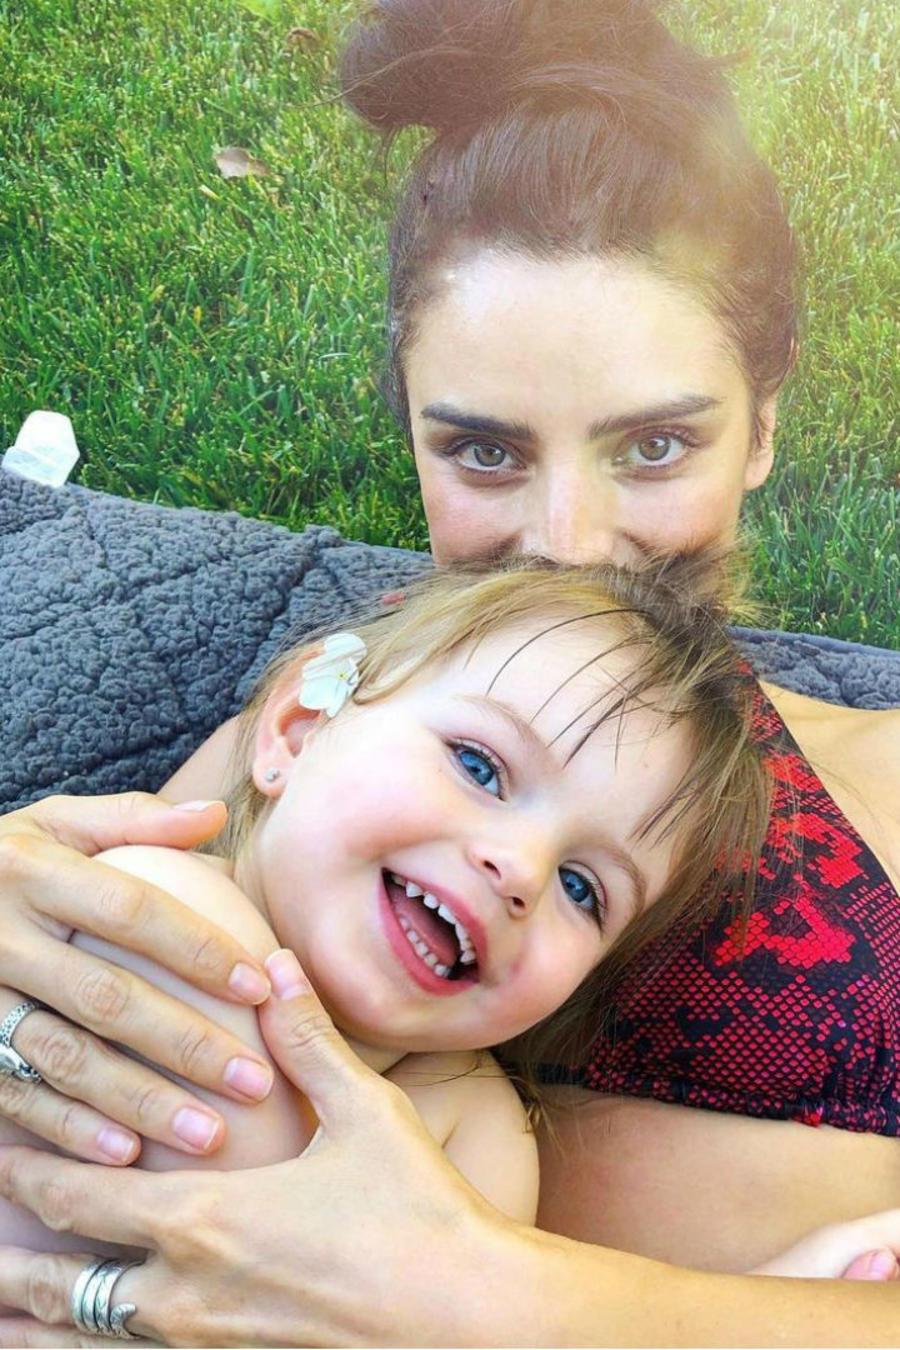 Aislinn Derbez y Salma Hayek hablan sobre su lactancia prolongada